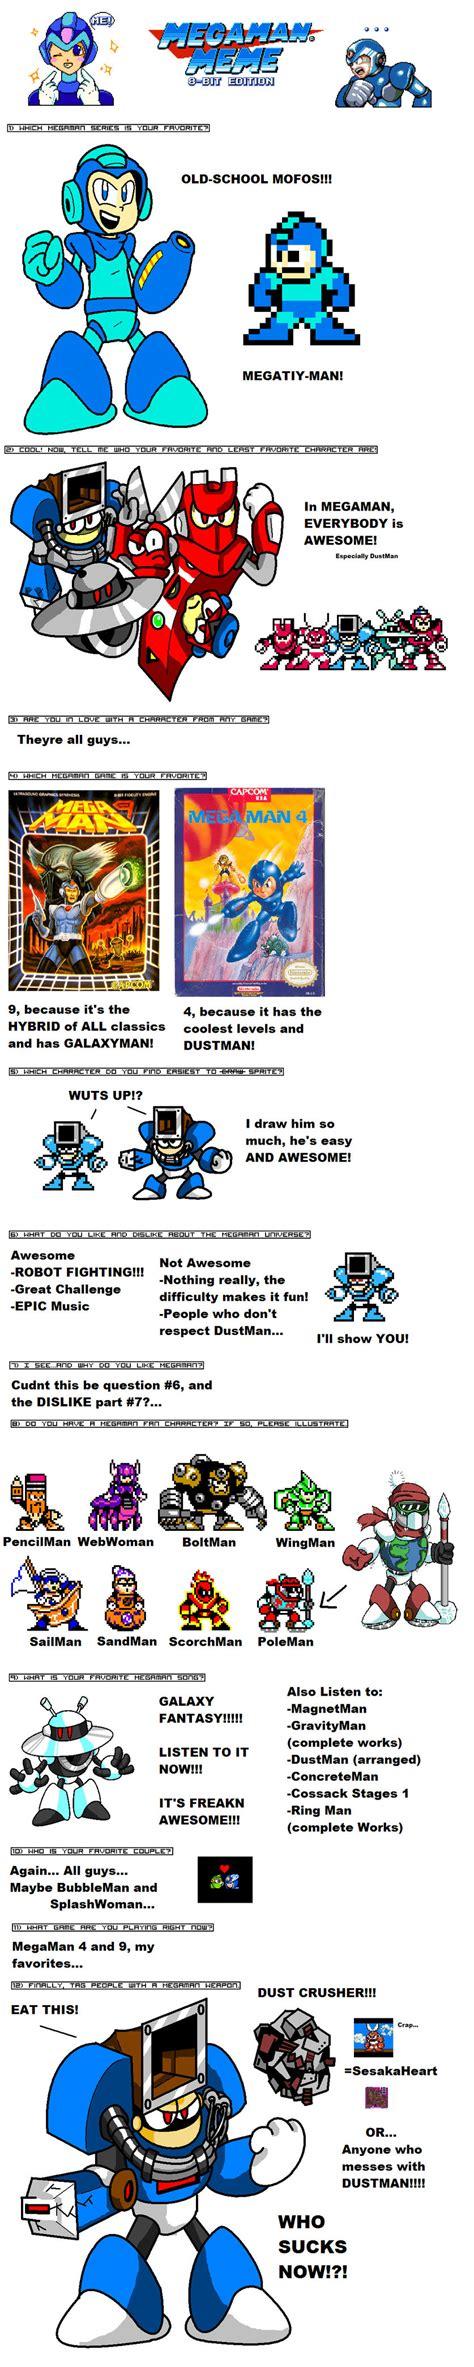 Mega Man Memes - marioshi64 megaman meme by marioshi64 on deviantart